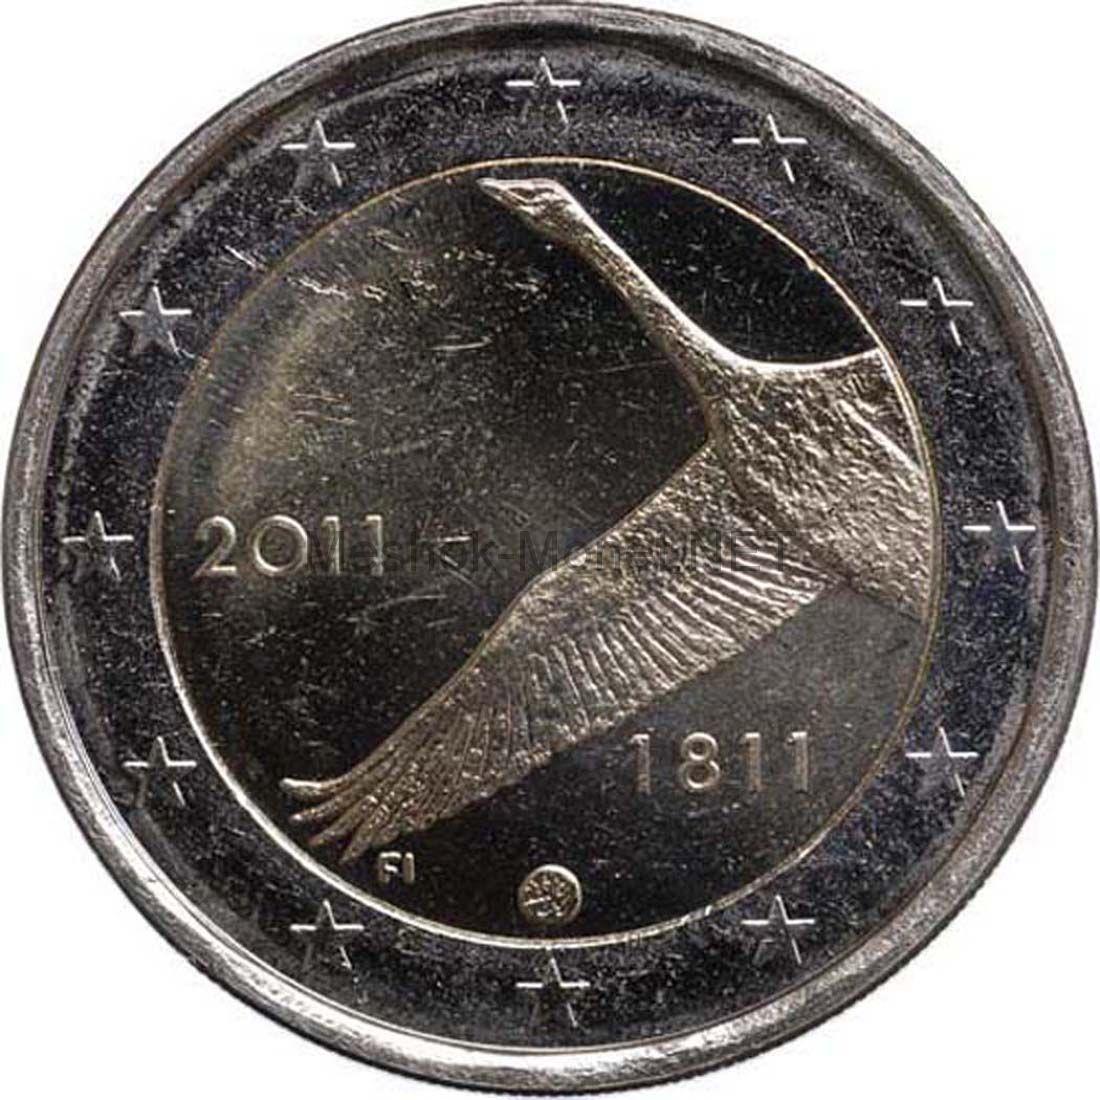 Финляндия 2 евро 2011, 200 лет банку